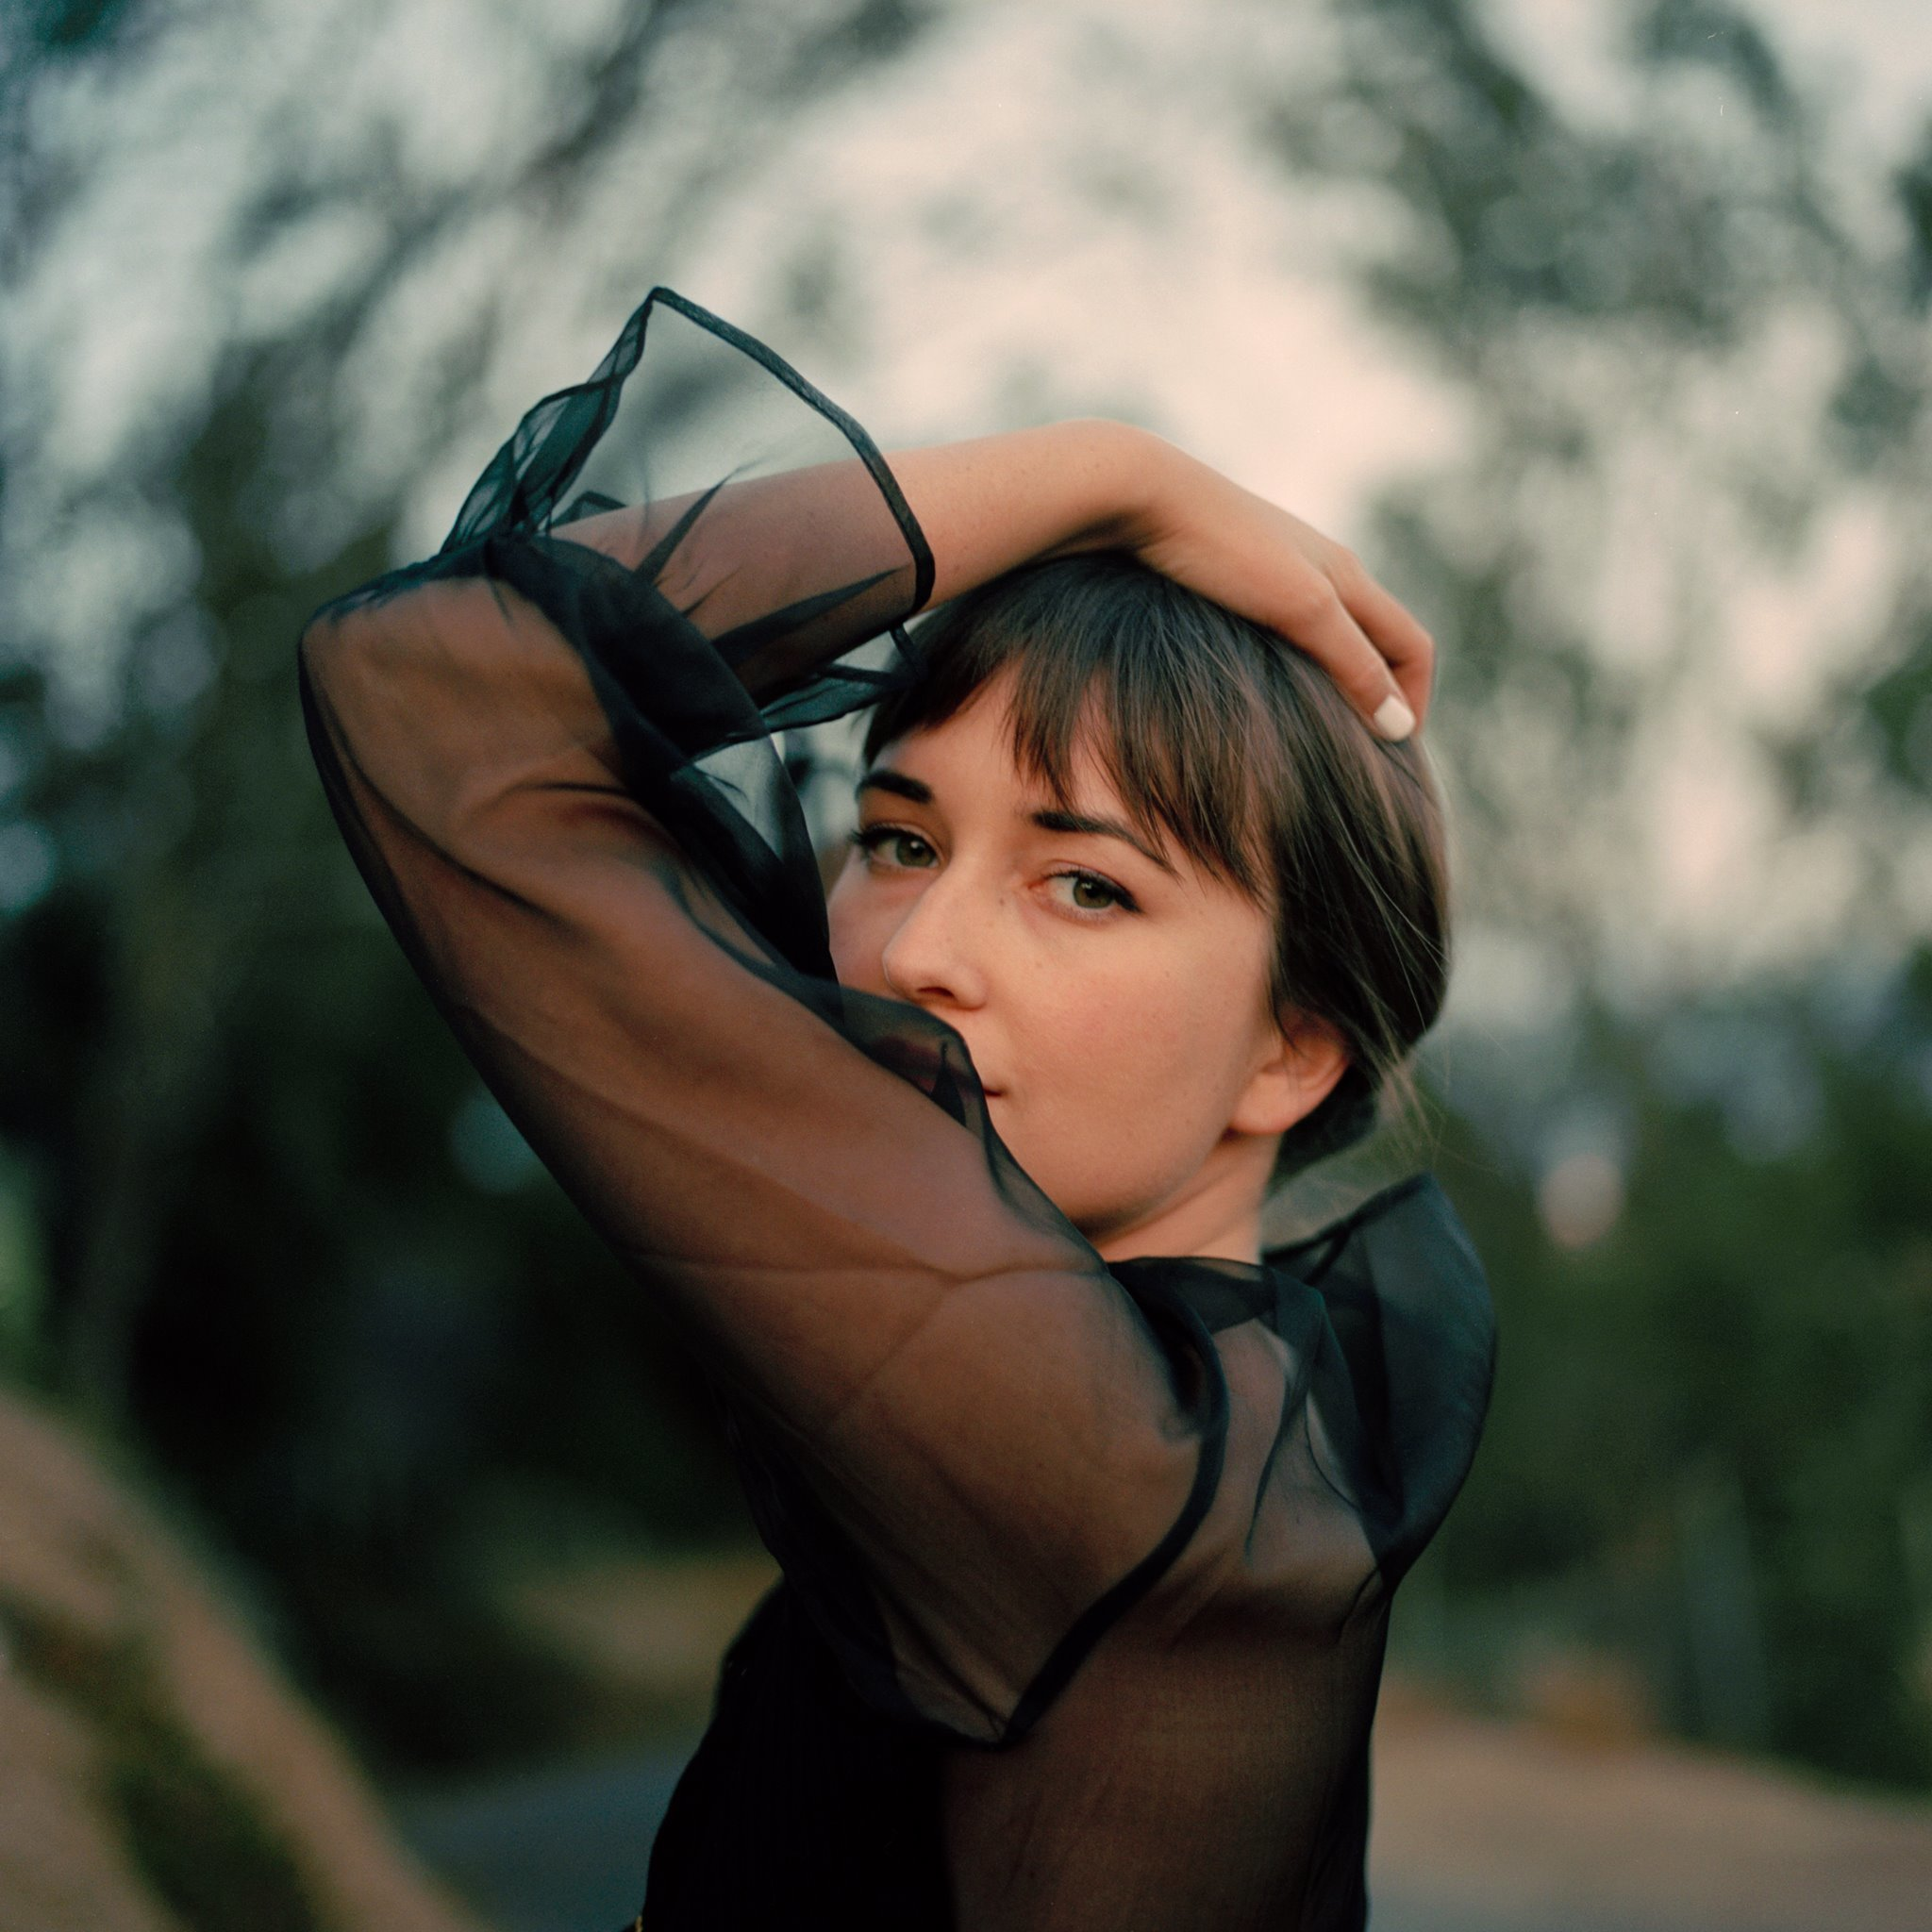 Jess Williamson / Cosmic Wink(LP)